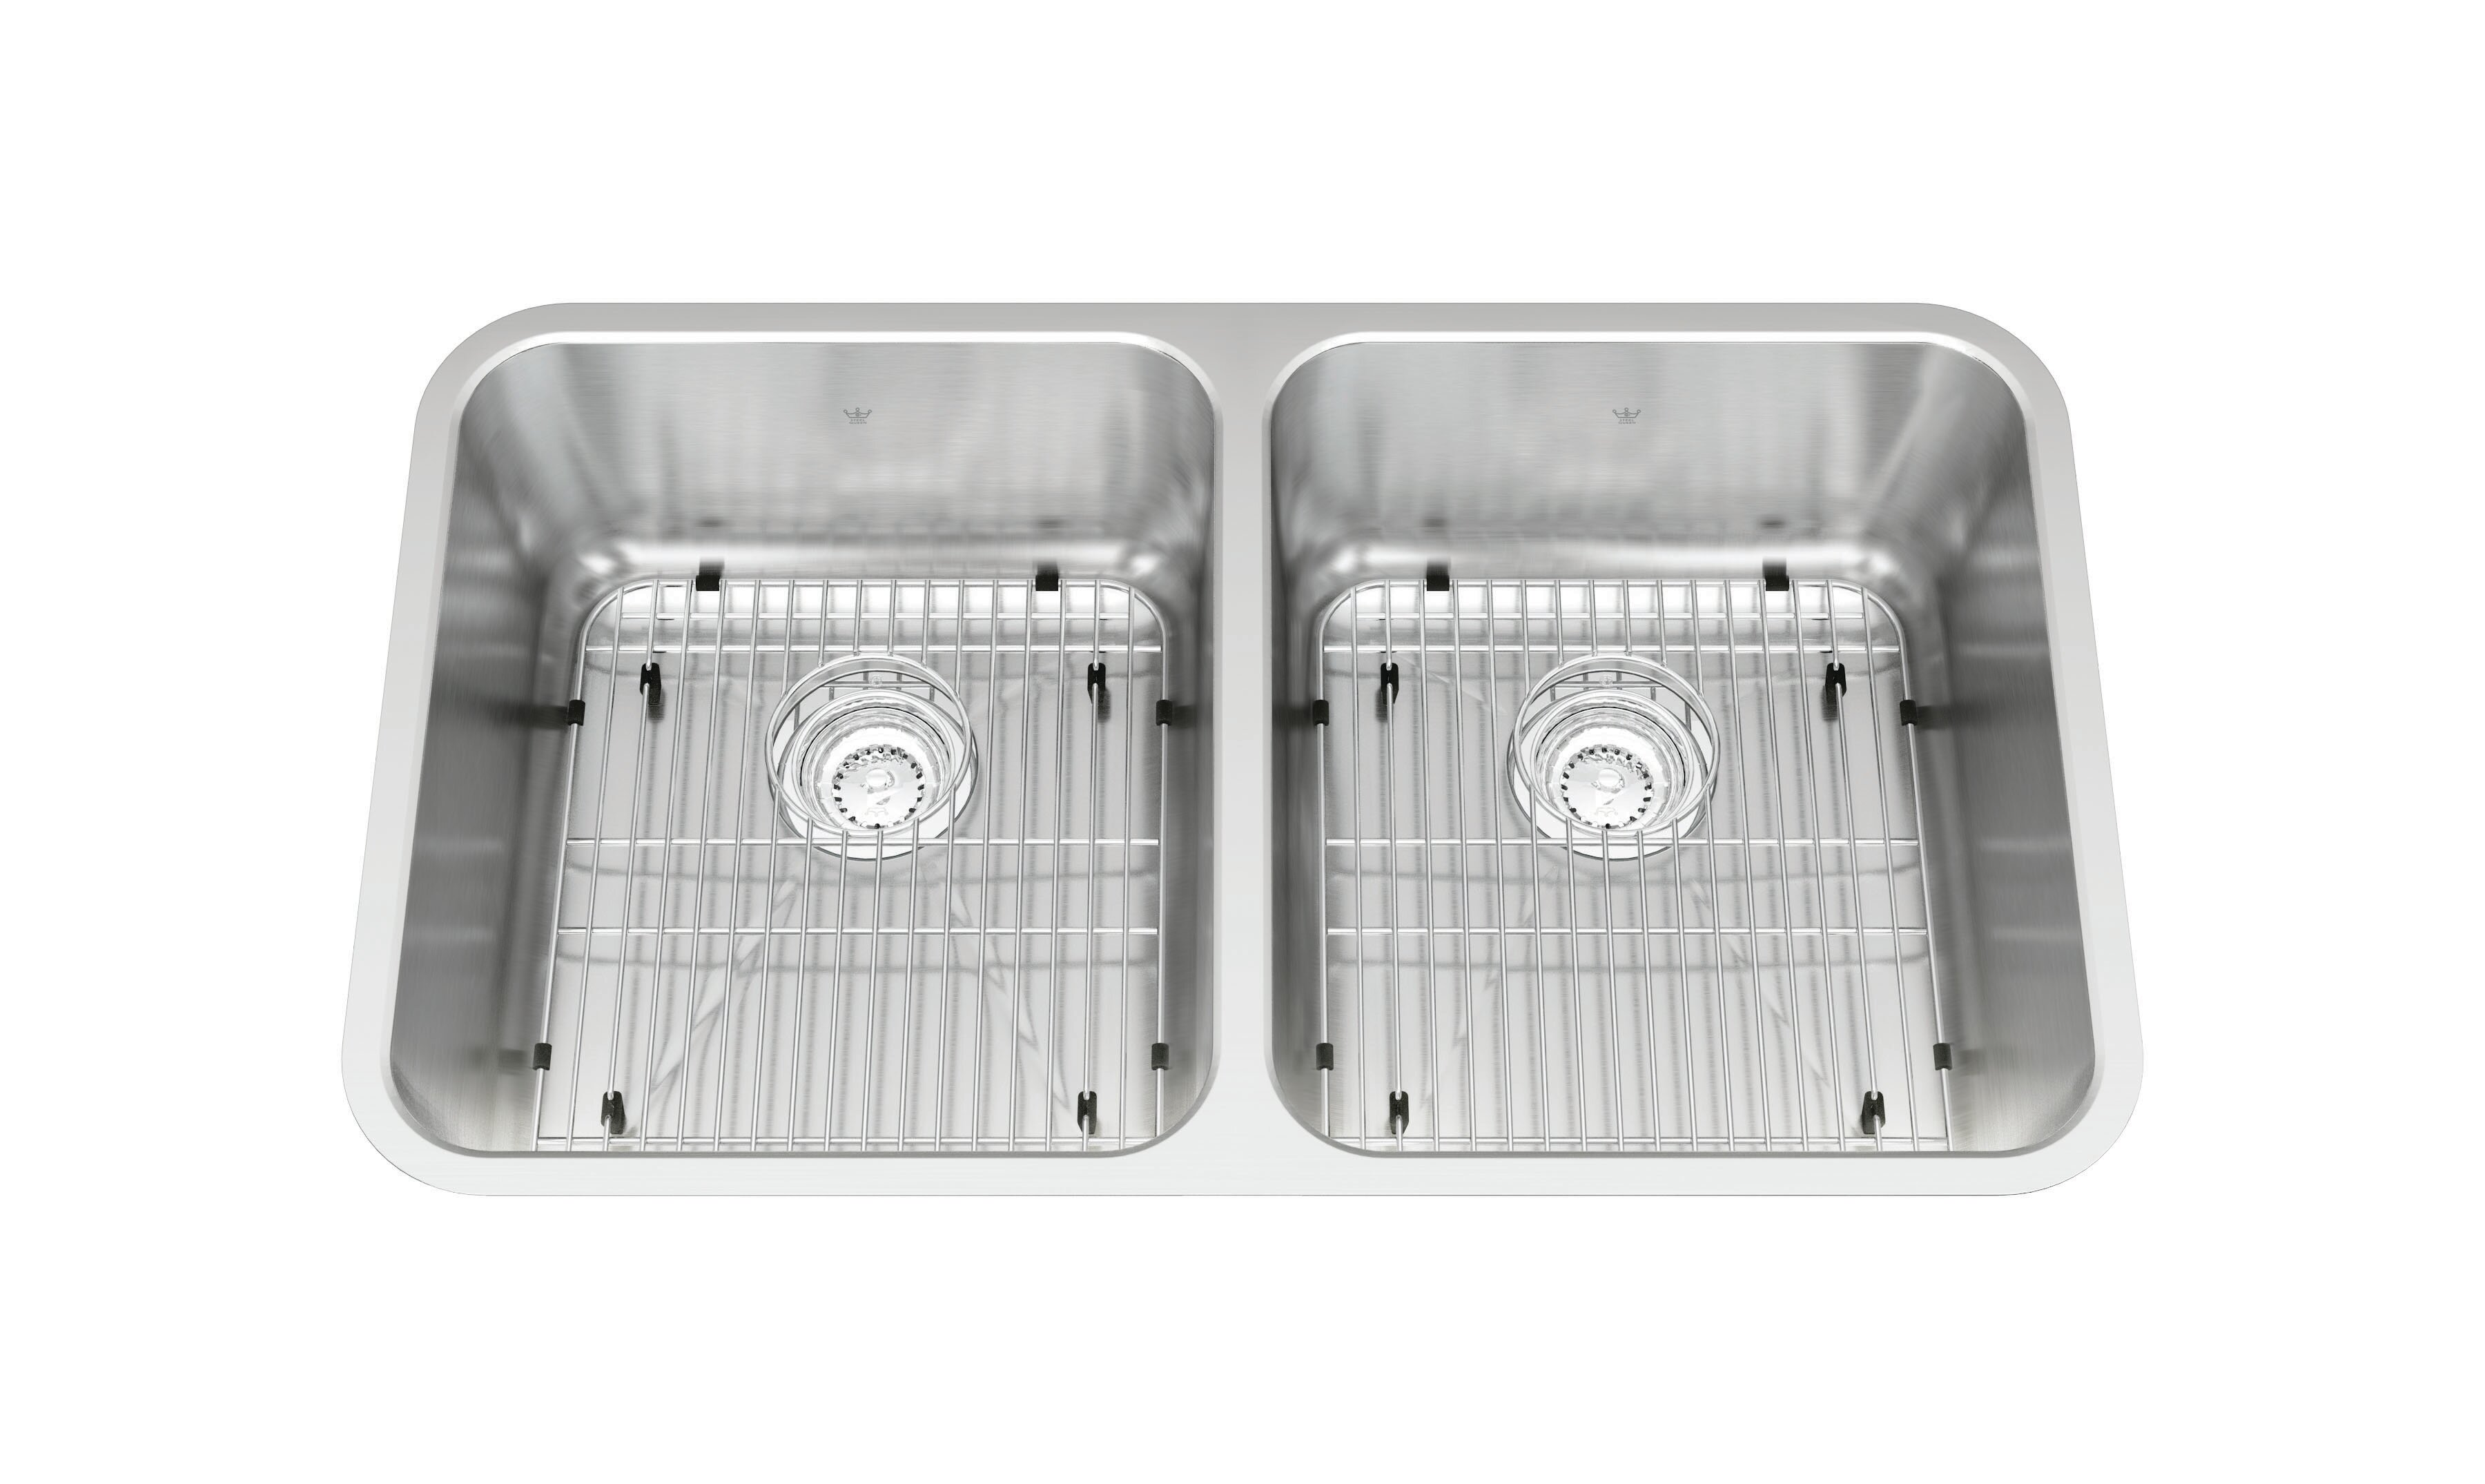 Stainless Steel Basket Sink Strainer for Kindred Sinks